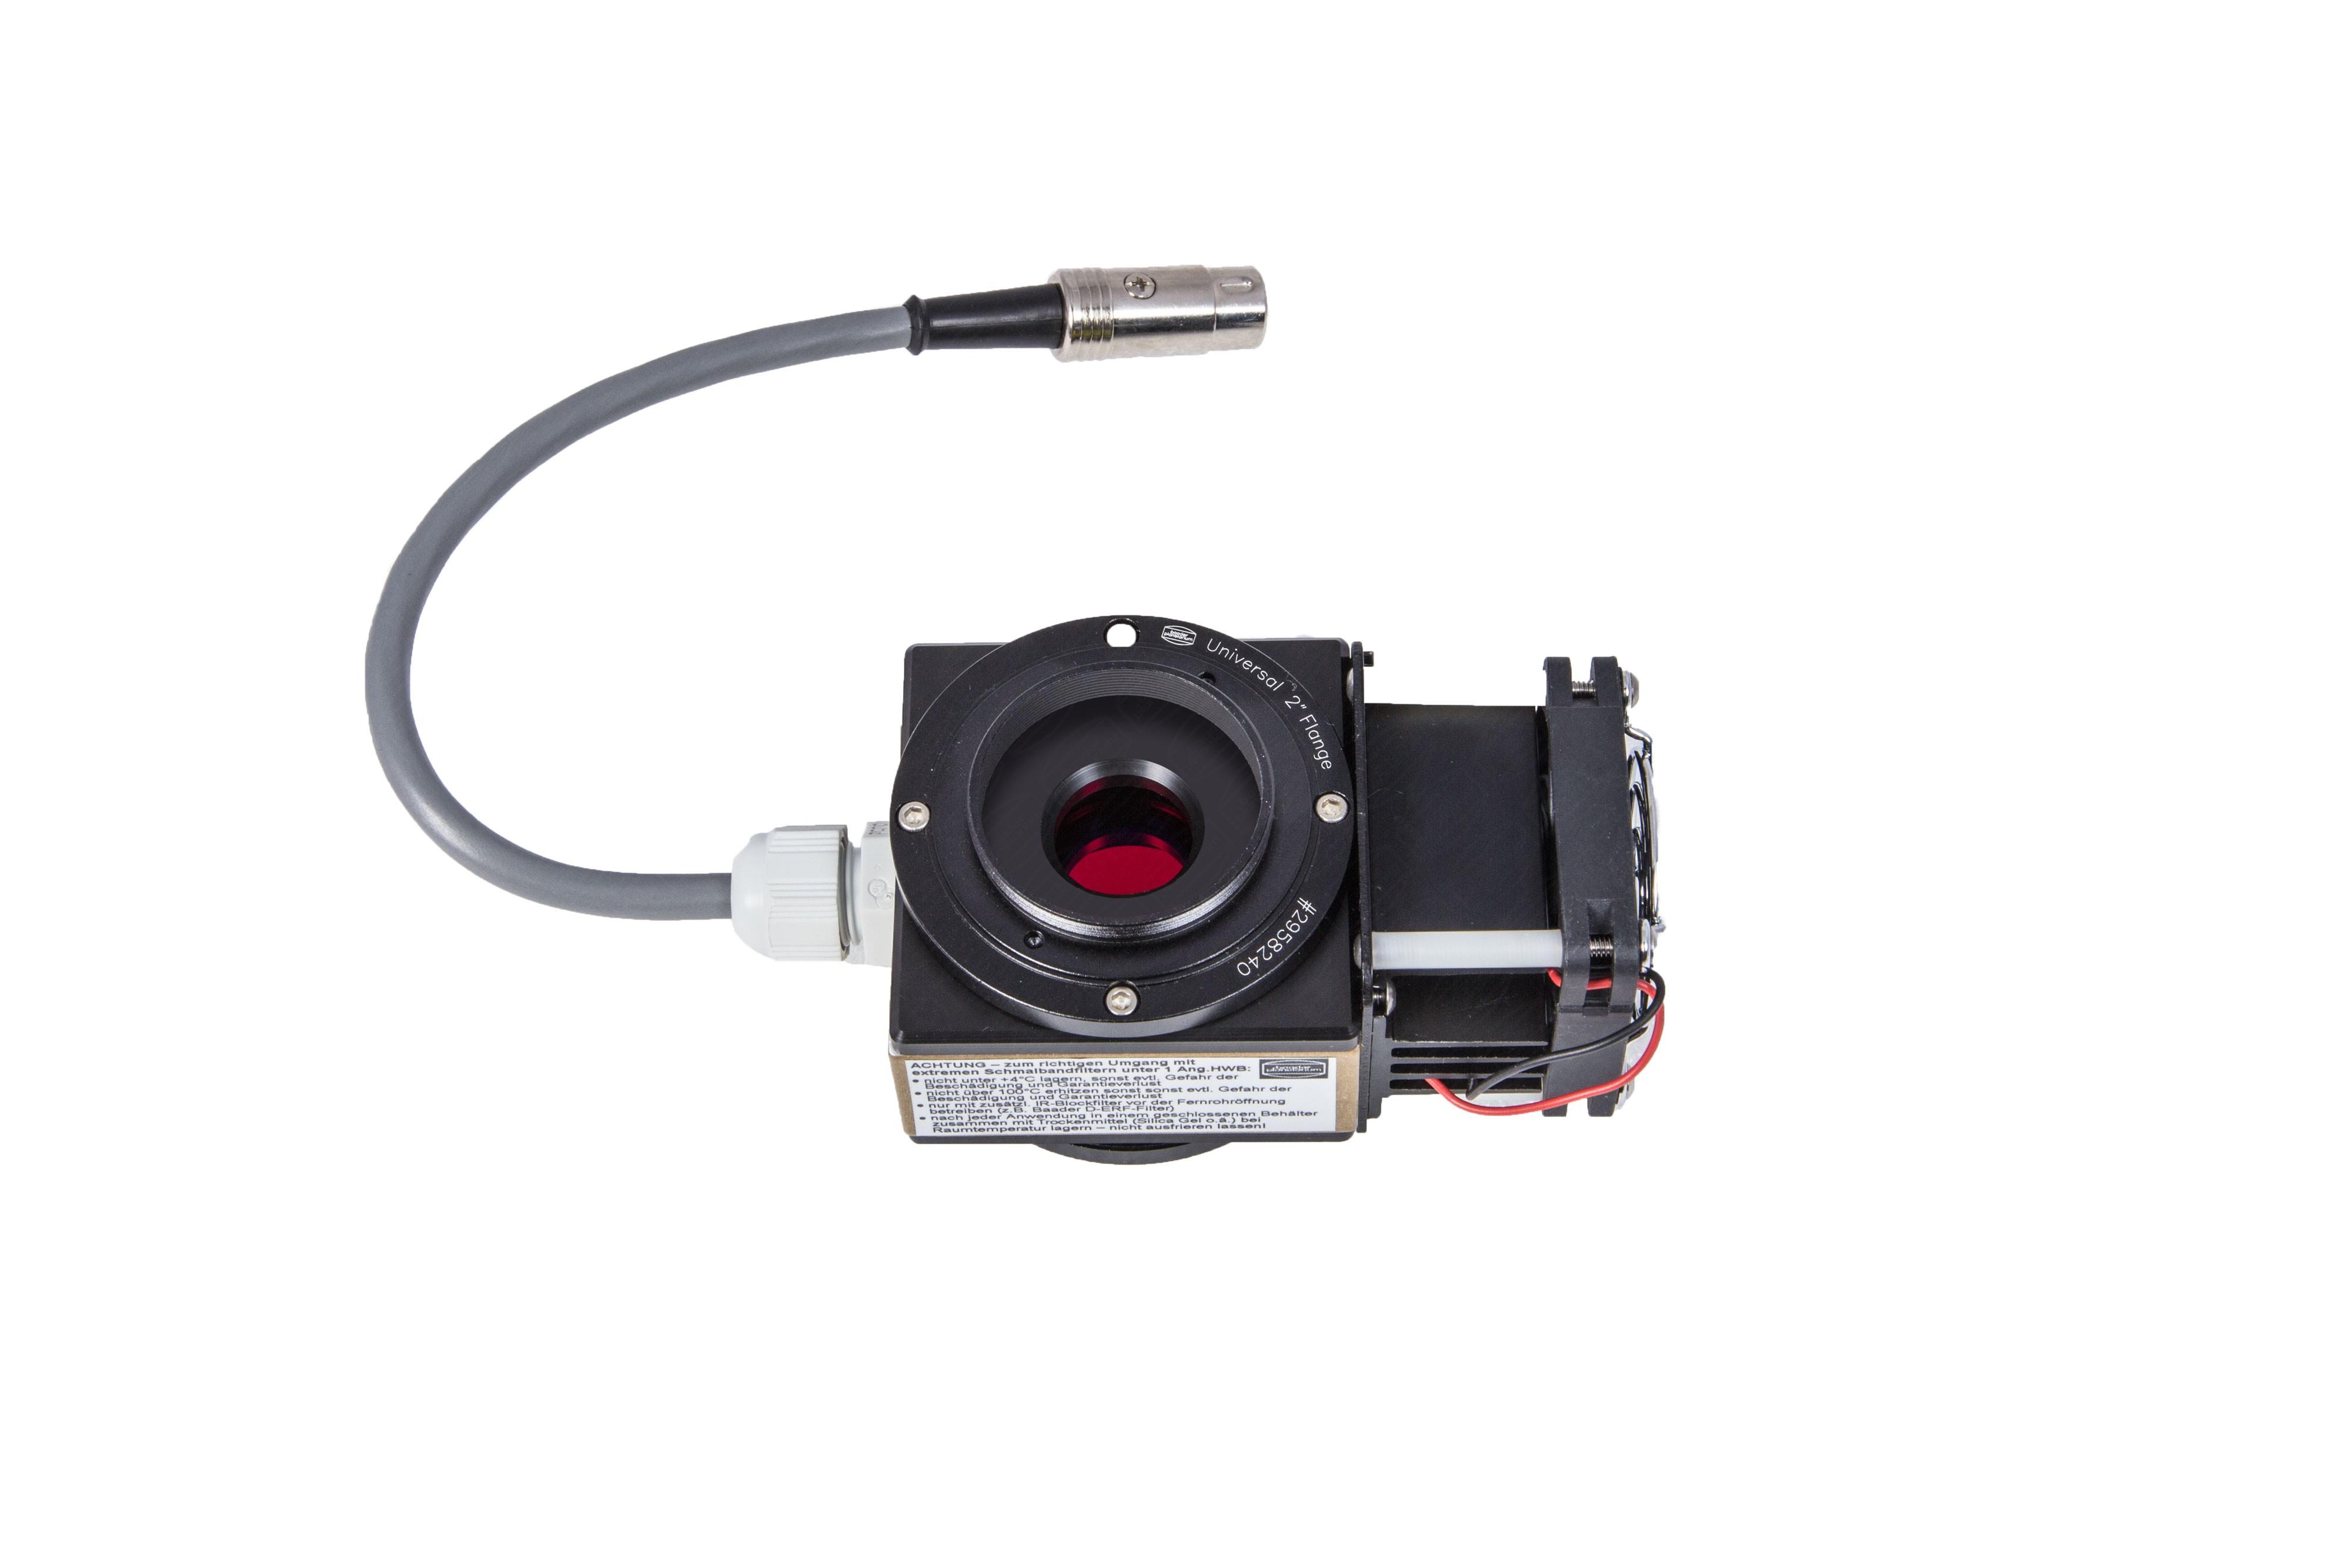 Solar Spectrum Observer Series 1 (19mm clear aperture)